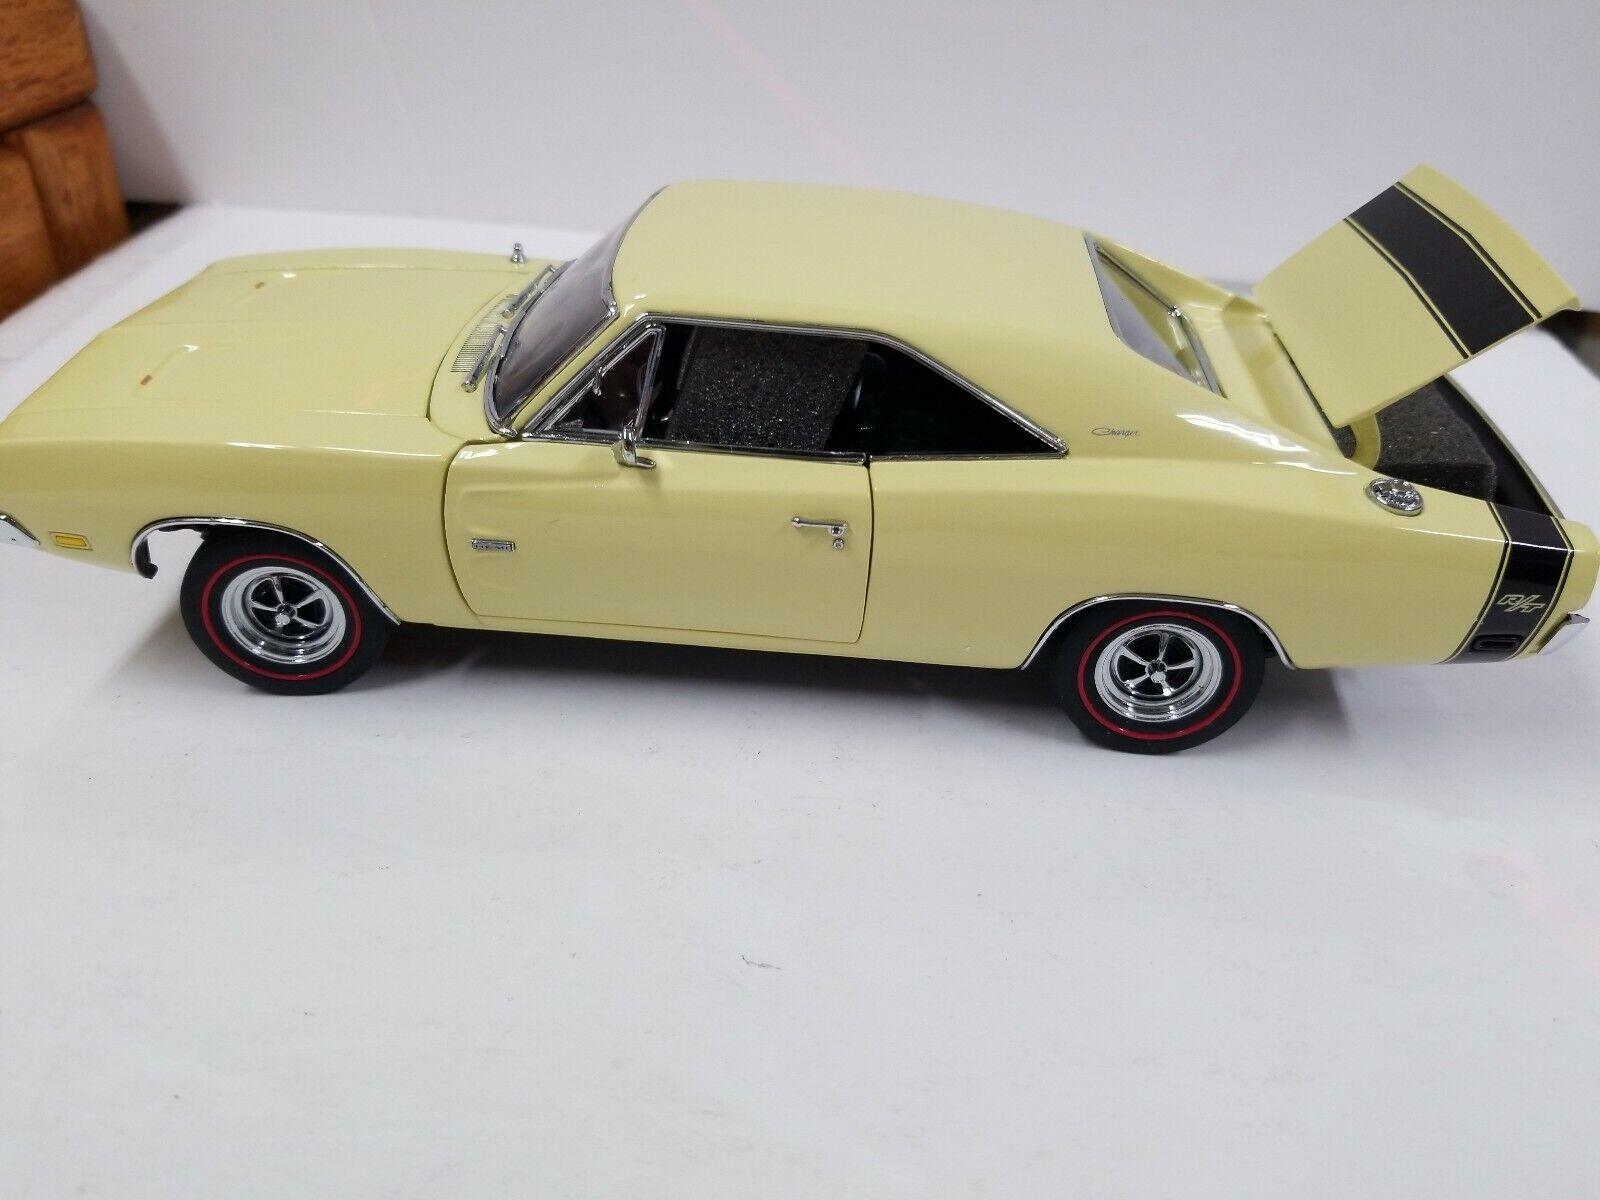 Danbury Nuovo di zecca 1969 Dodge Charger RT